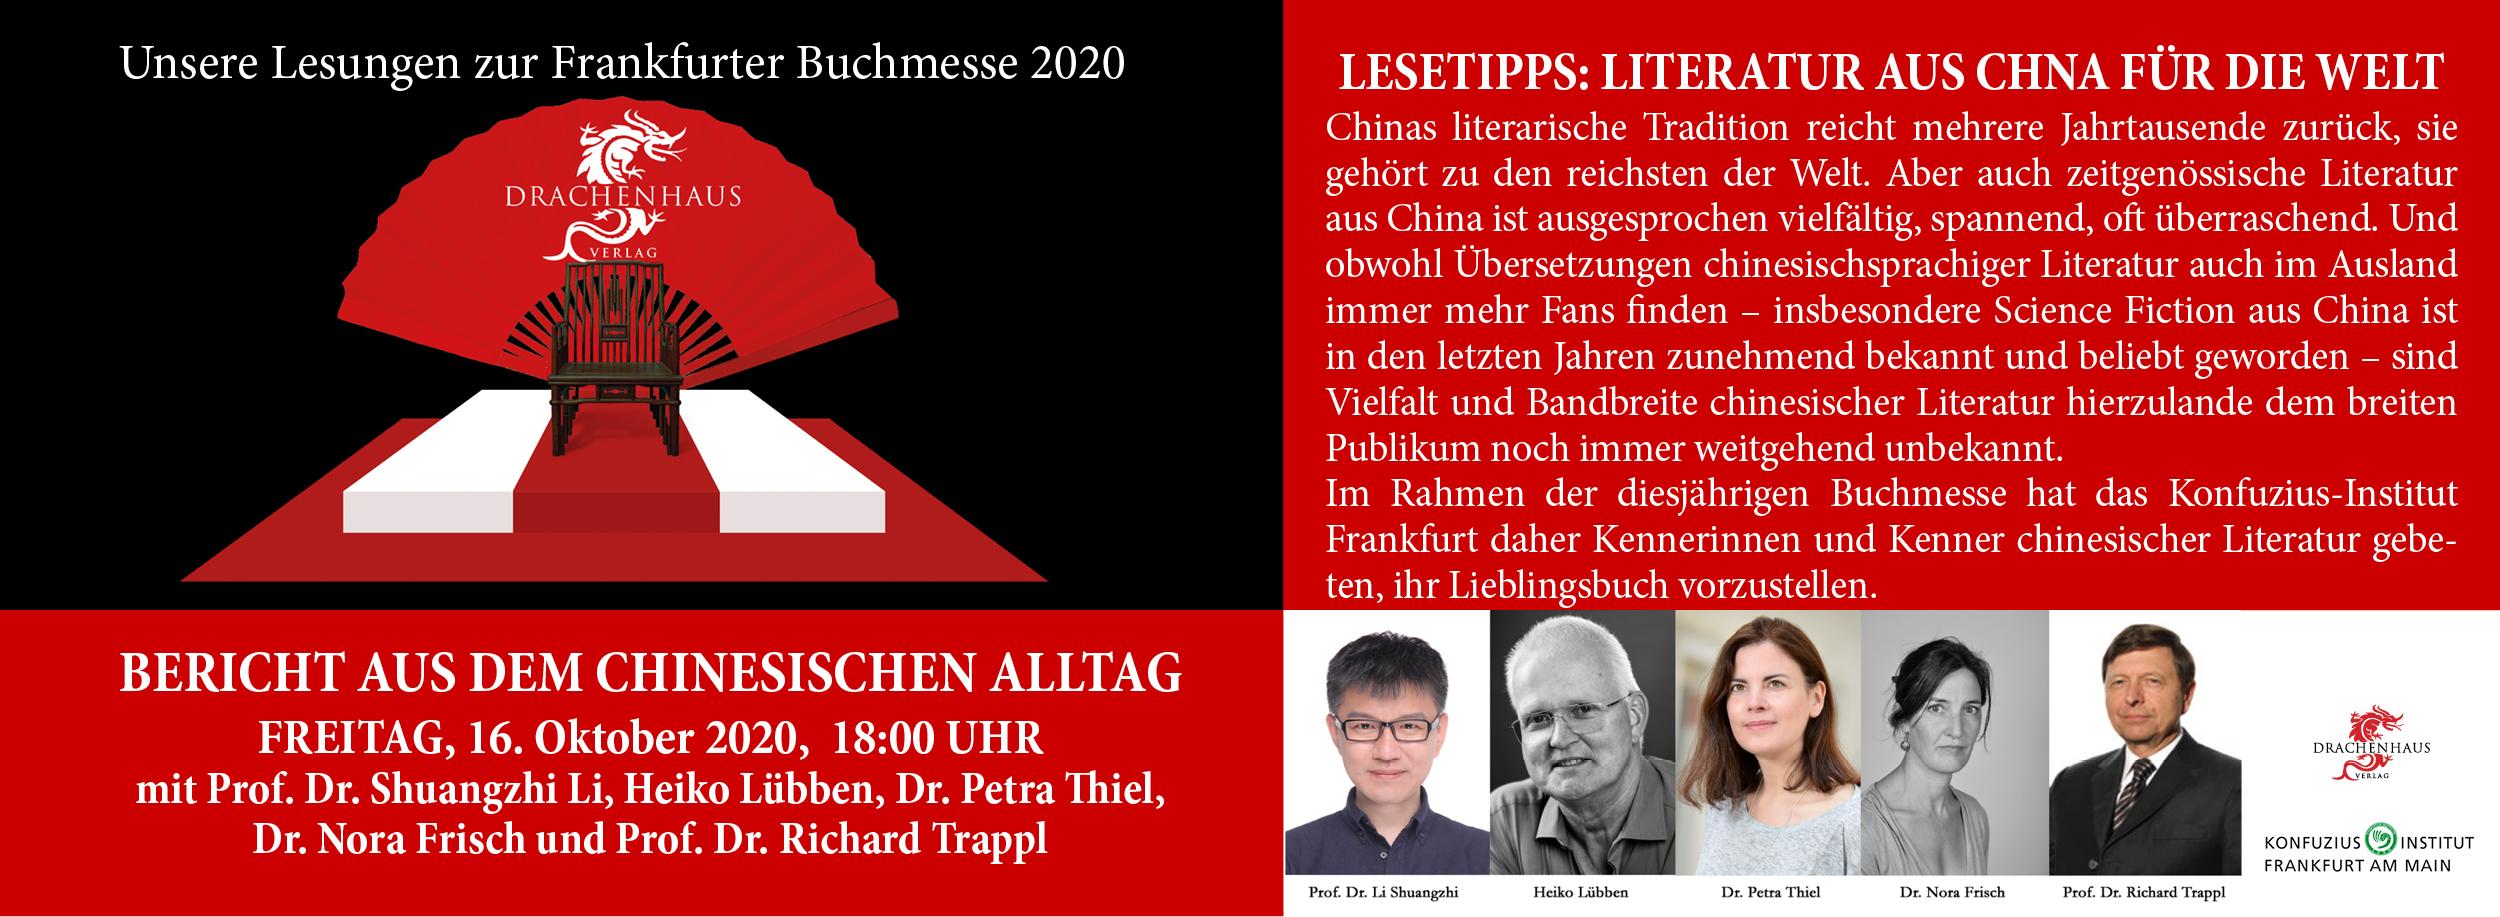 Lesetipps. Drachenhaus Verlag. Libellenaugen. Konfuzius Institut Frankfurt